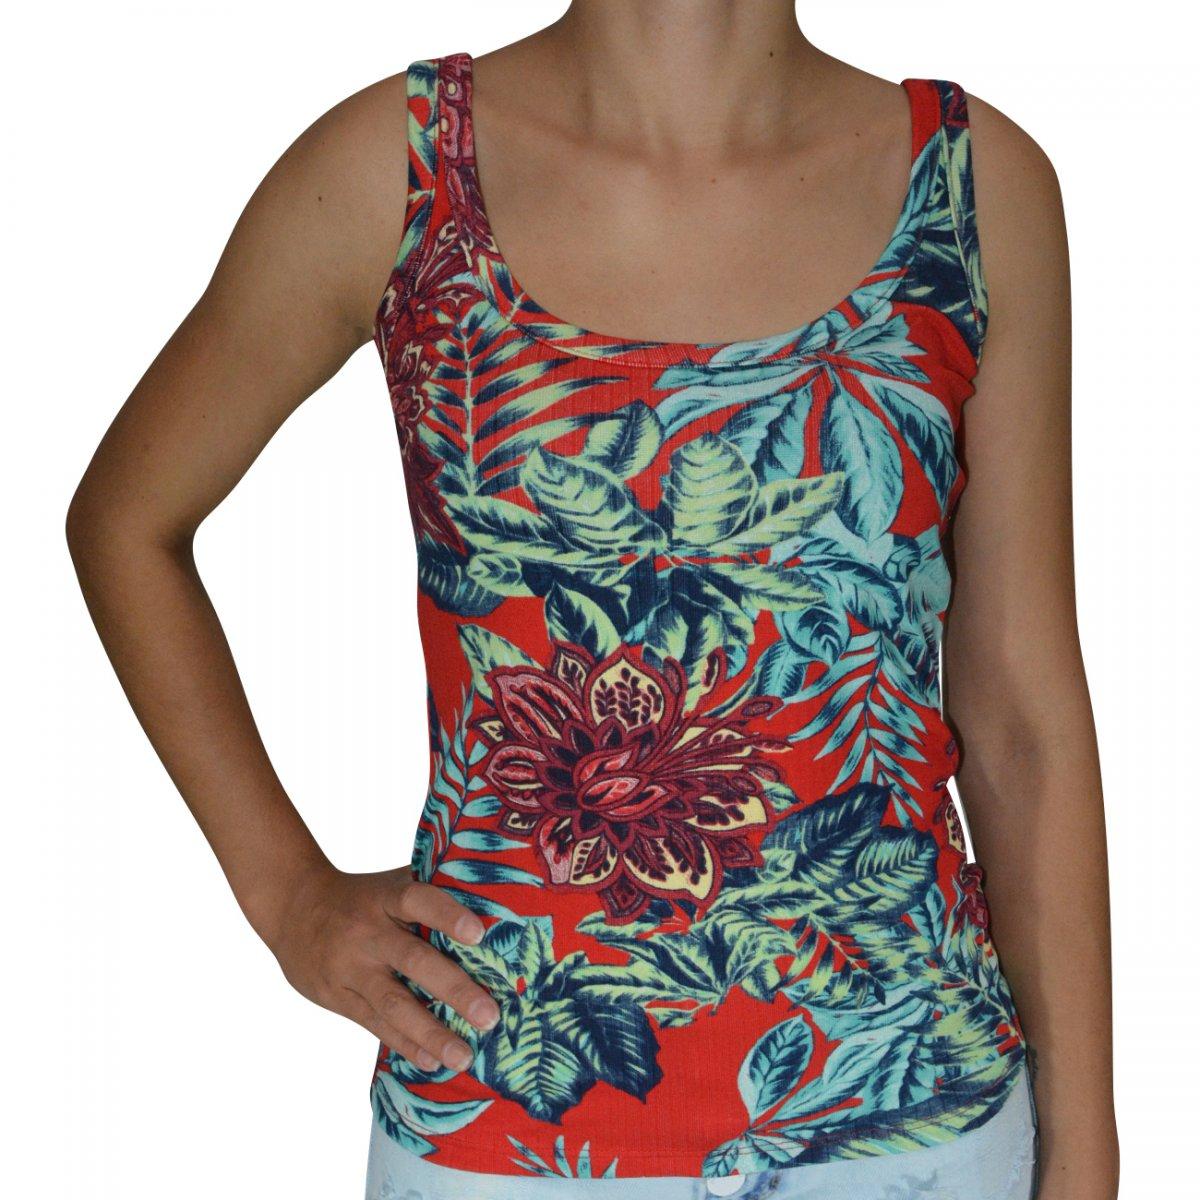 b7fb253968e Regata Linha Leve 5032 5032 - Floral - Chuteira Nike